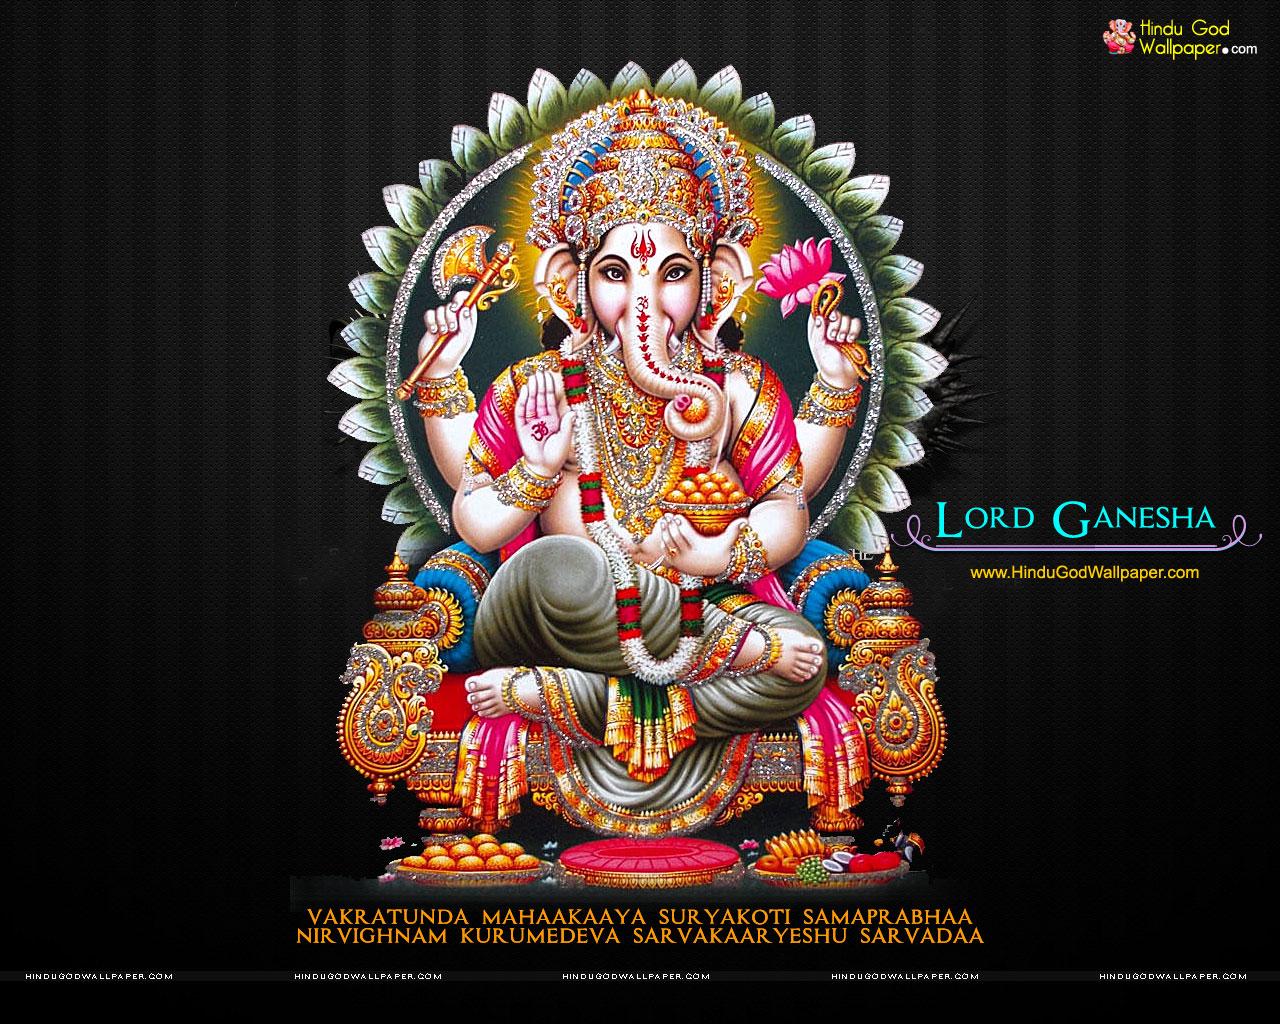 Lord Ganesha Mobile Wallpaper Mobile Wallpapers Download - Full Hd Vinayagar Images Hd 1080p - HD Wallpaper